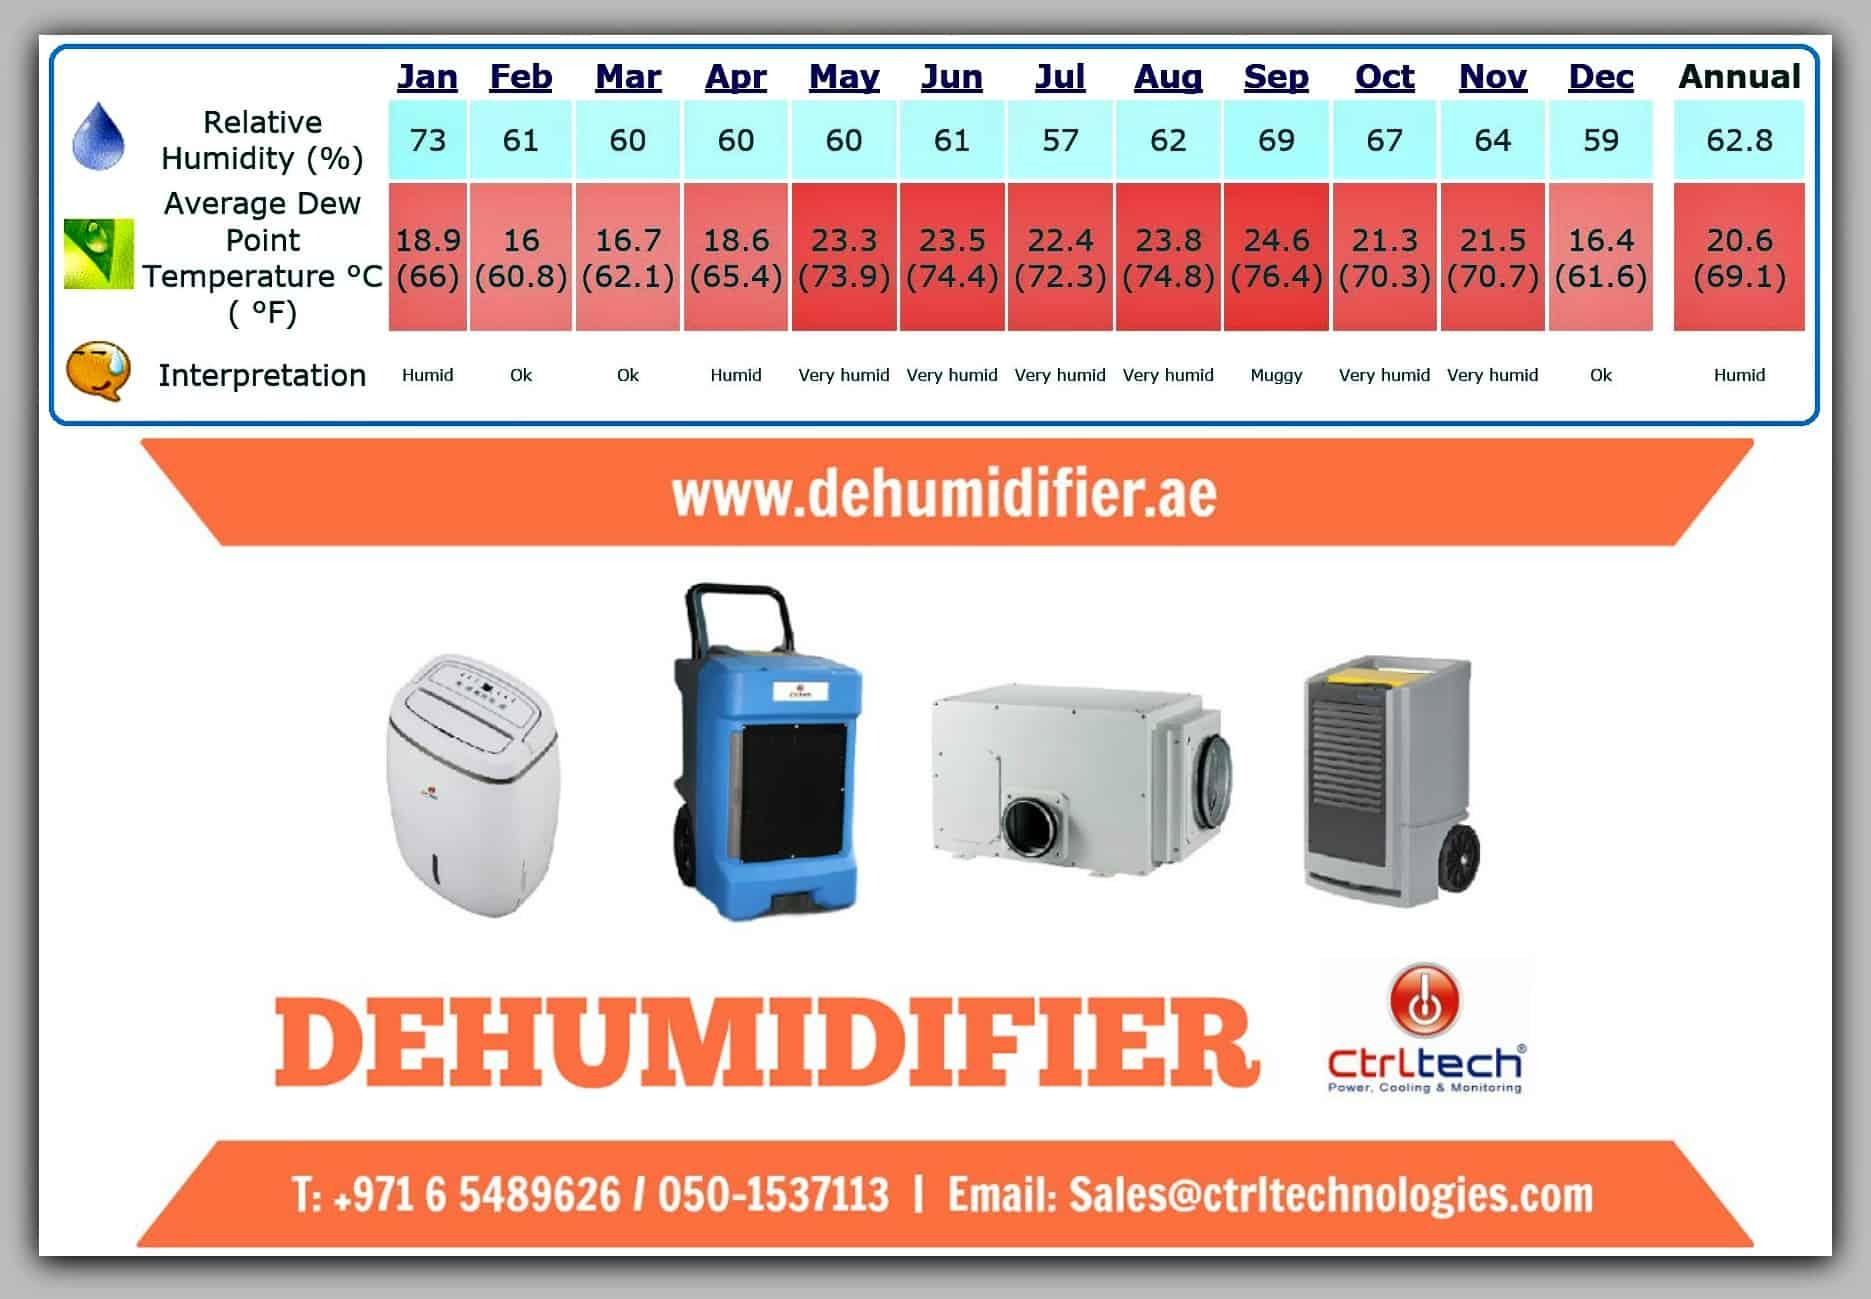 Industrial Dehumidifier in Saudi Arabia Jeddah and Riyadh.